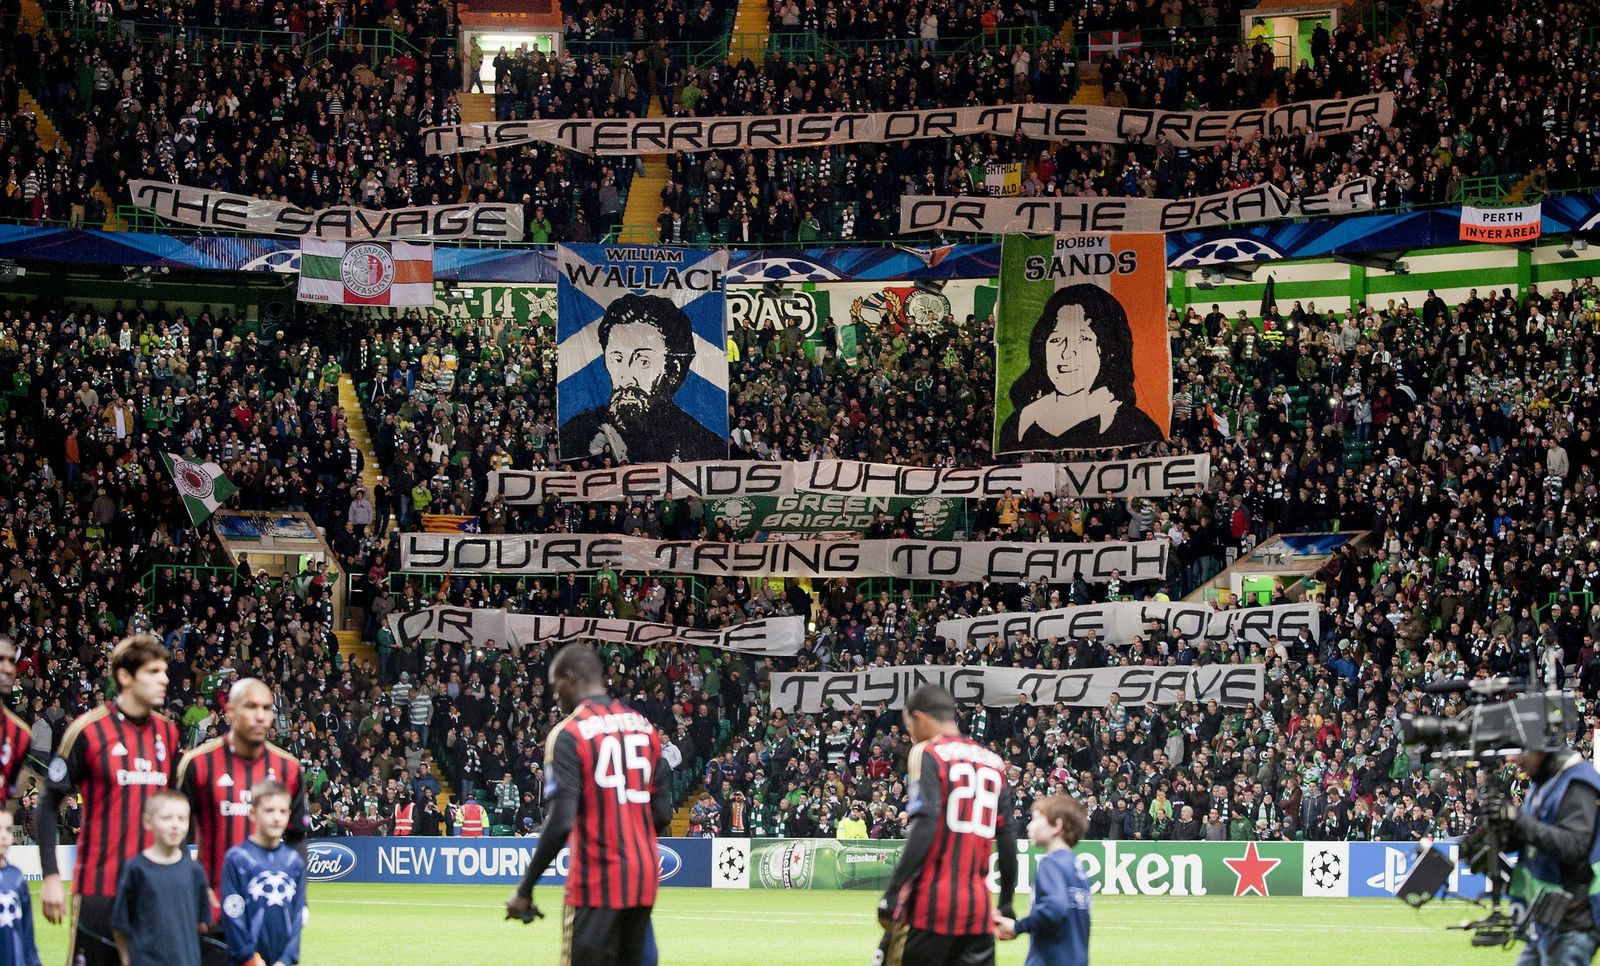 Celtic Glasgow / Mailand / Bobby Sands